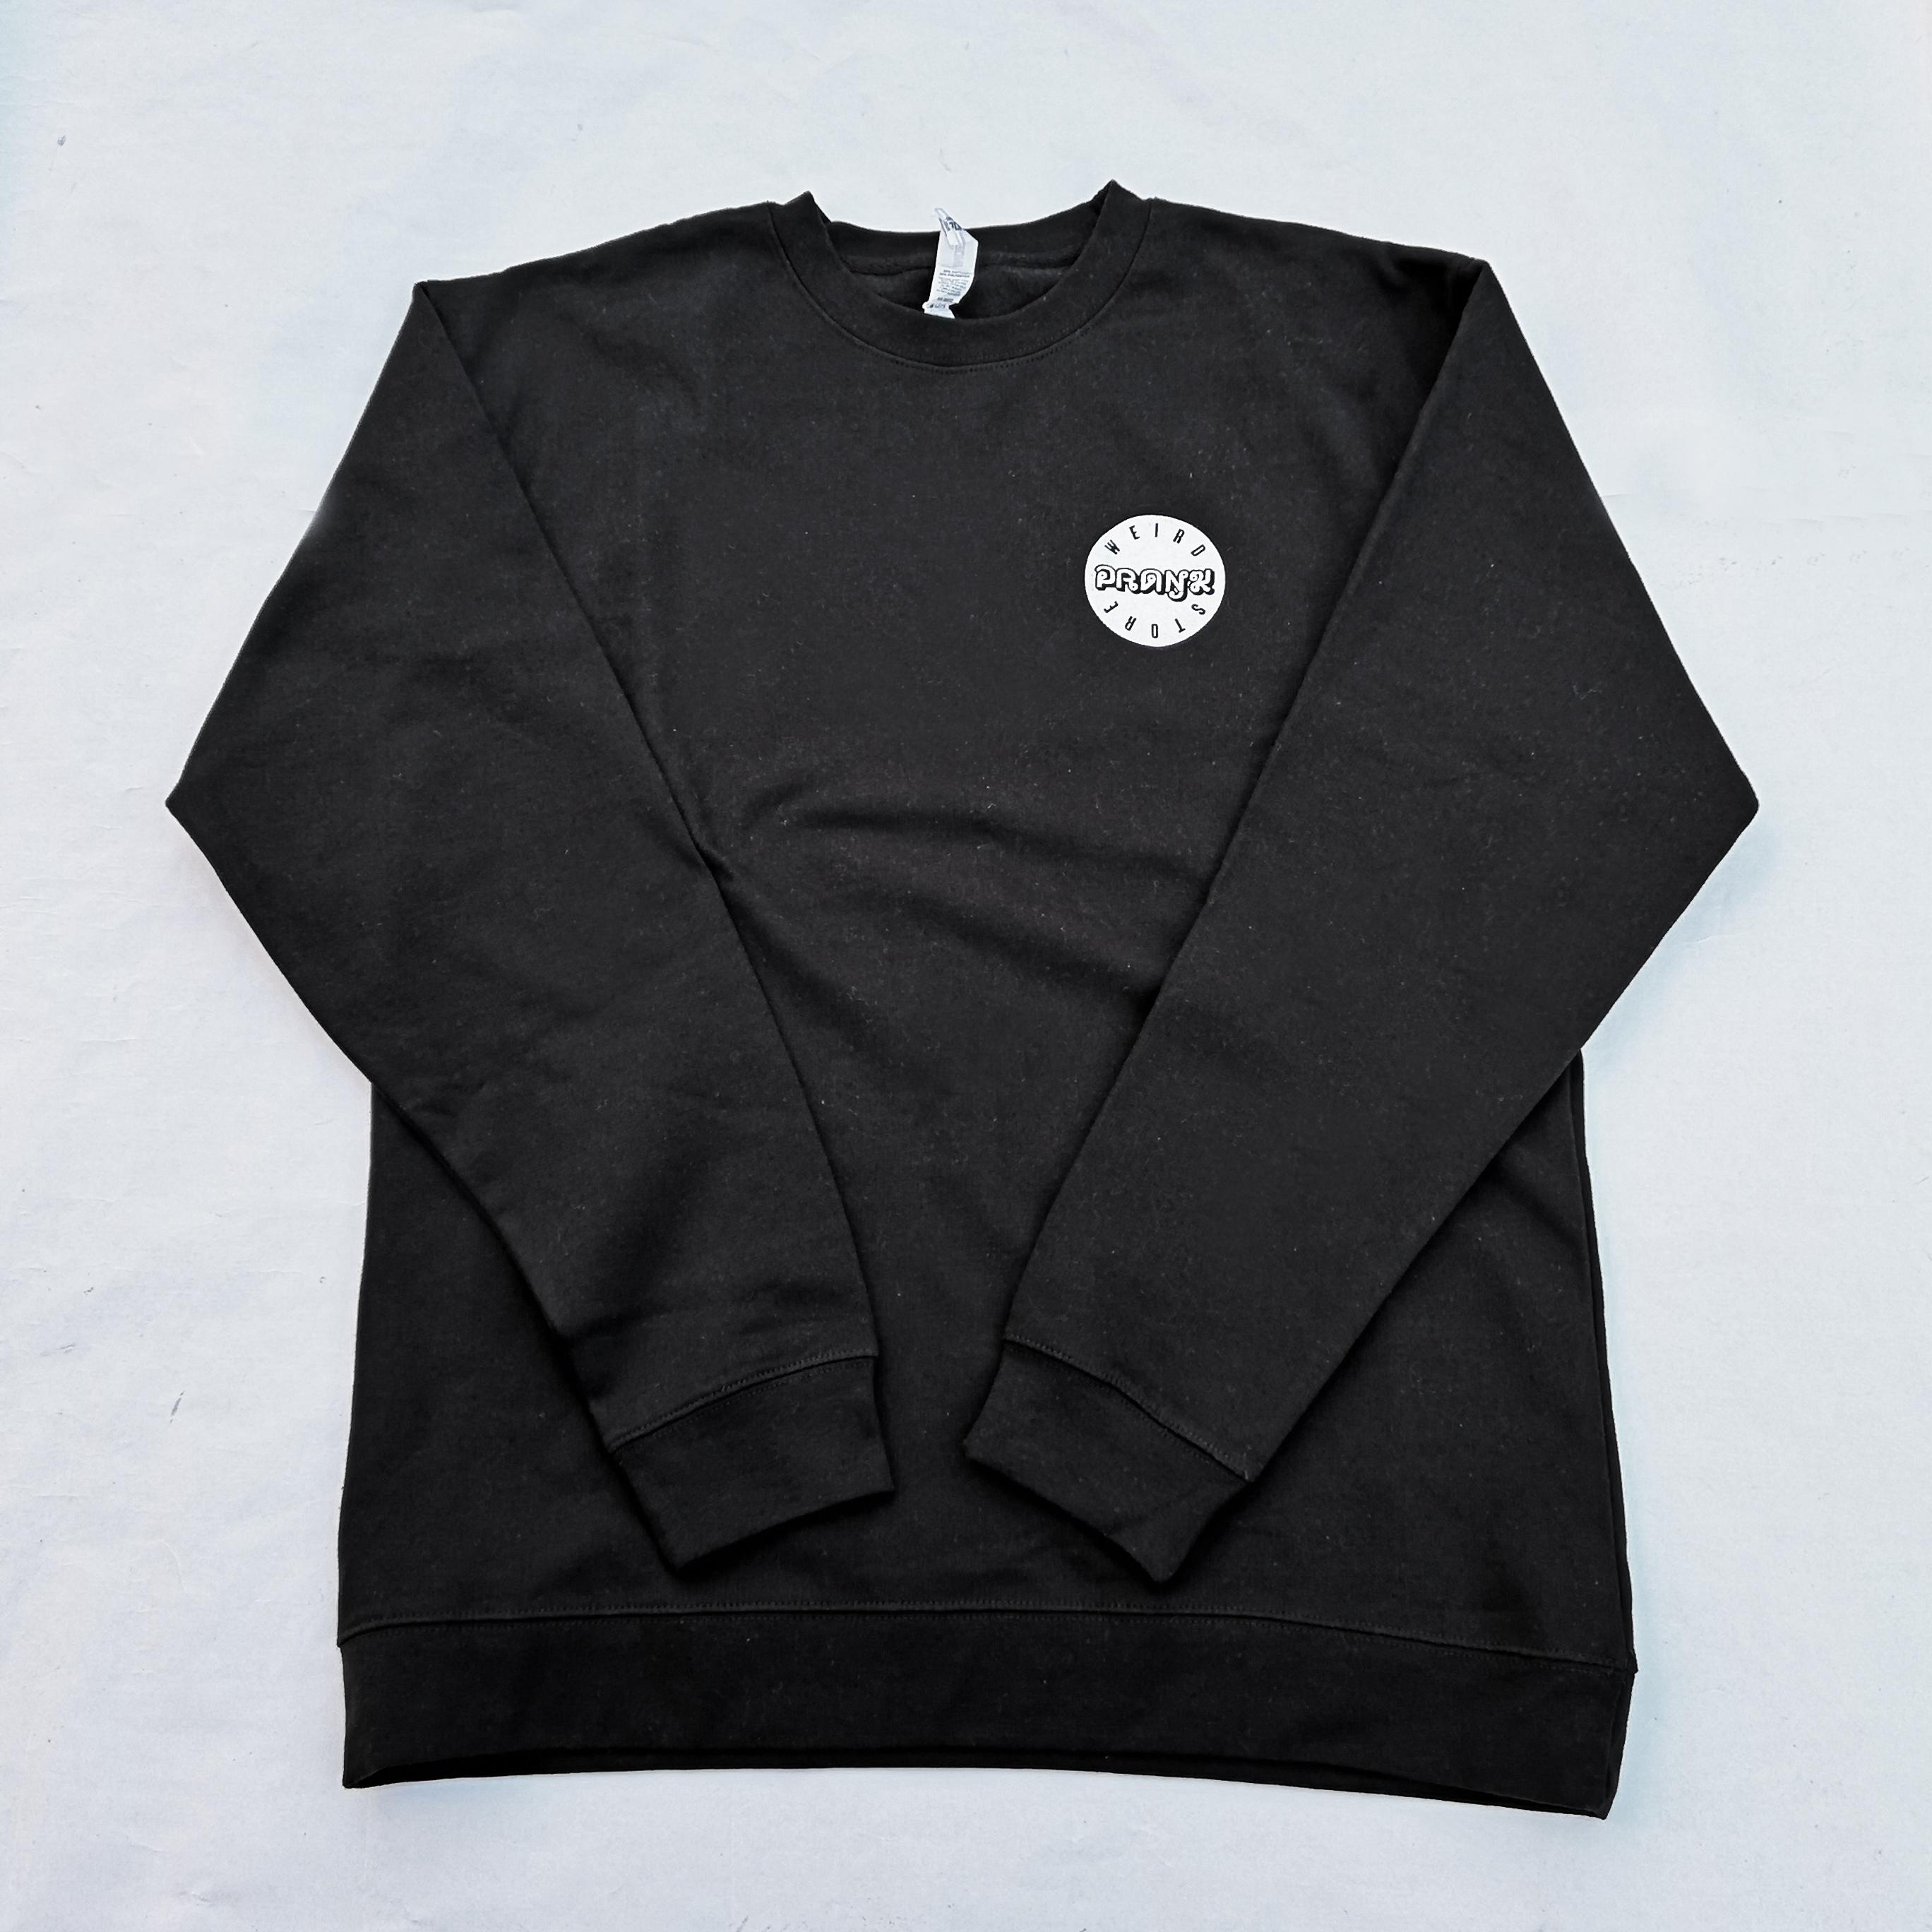 PRANK SIGN SWEAT BLACK XL